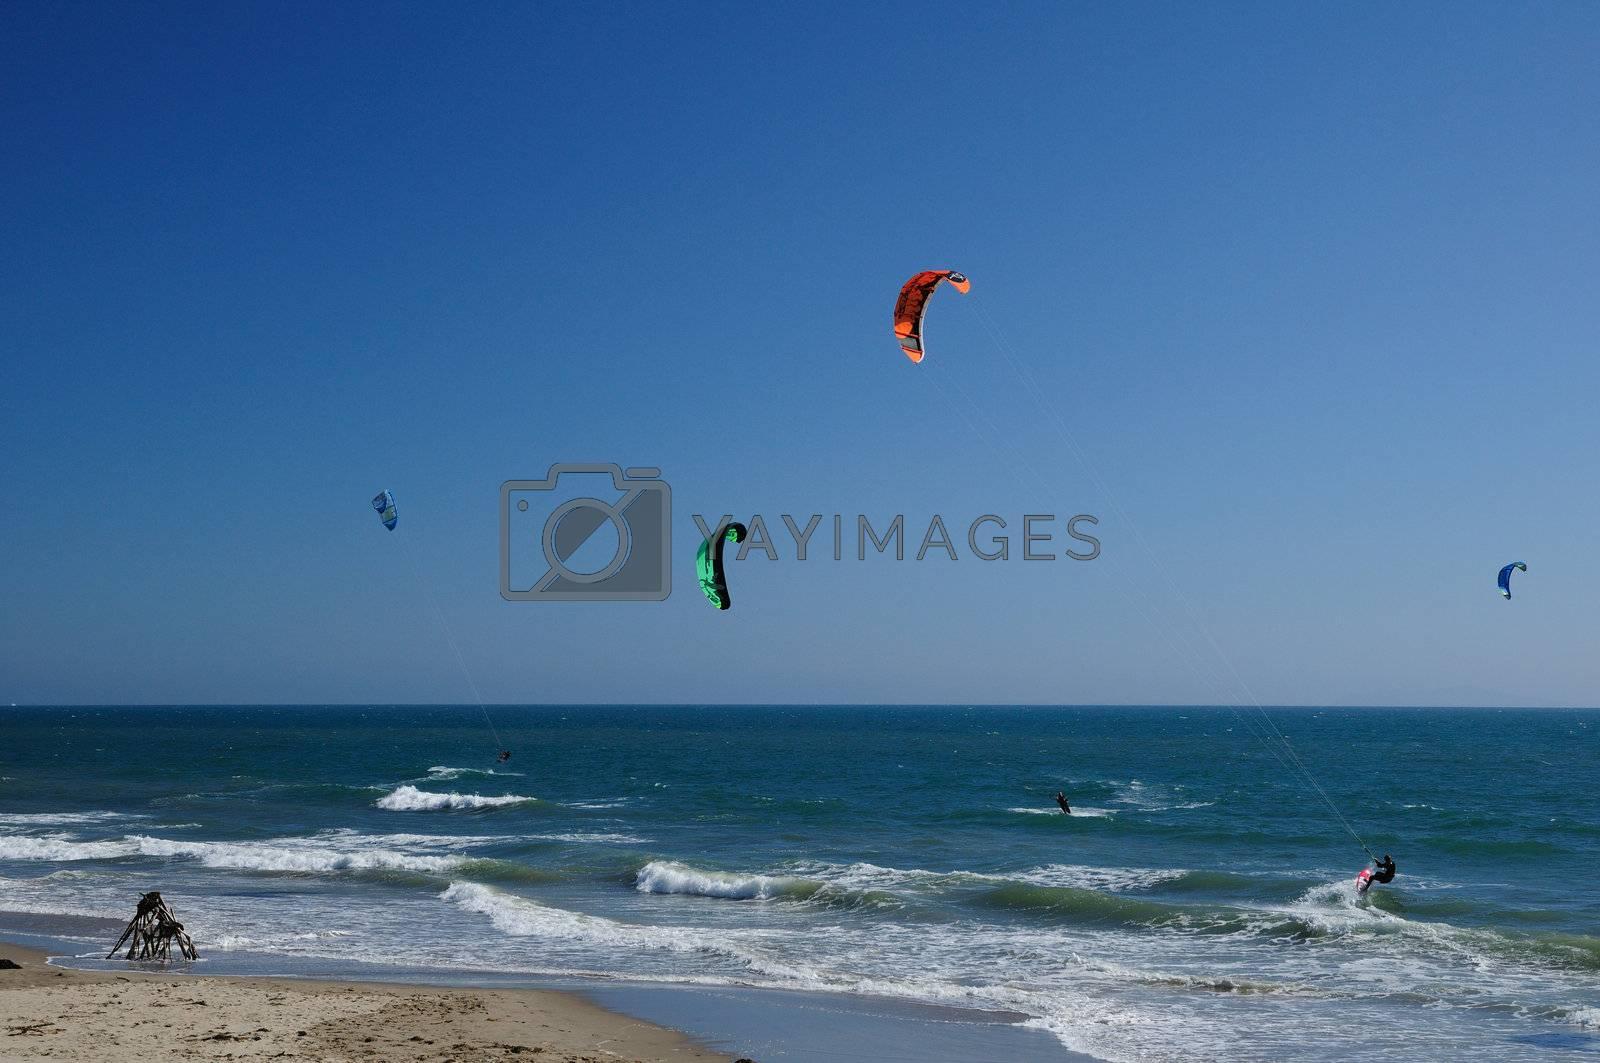 A driftwood teepee sets the scene for kitesurfing fun